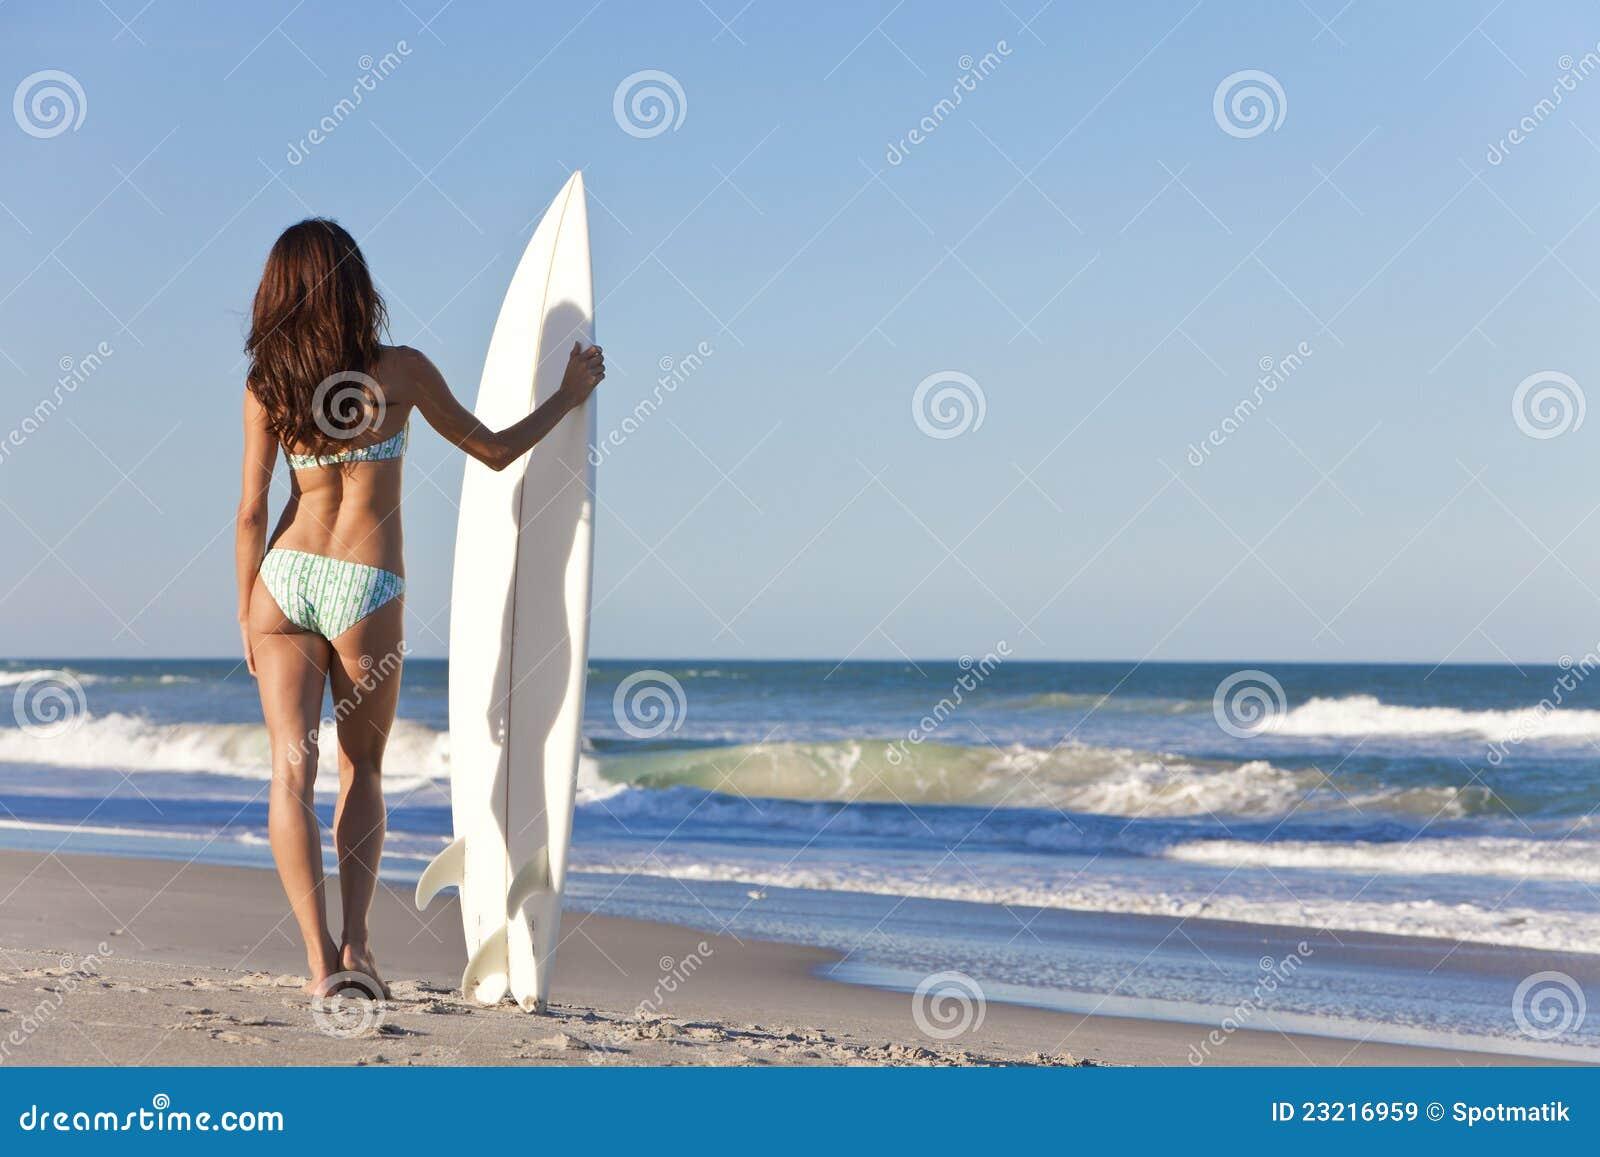 For Bikini surf board sorry, that